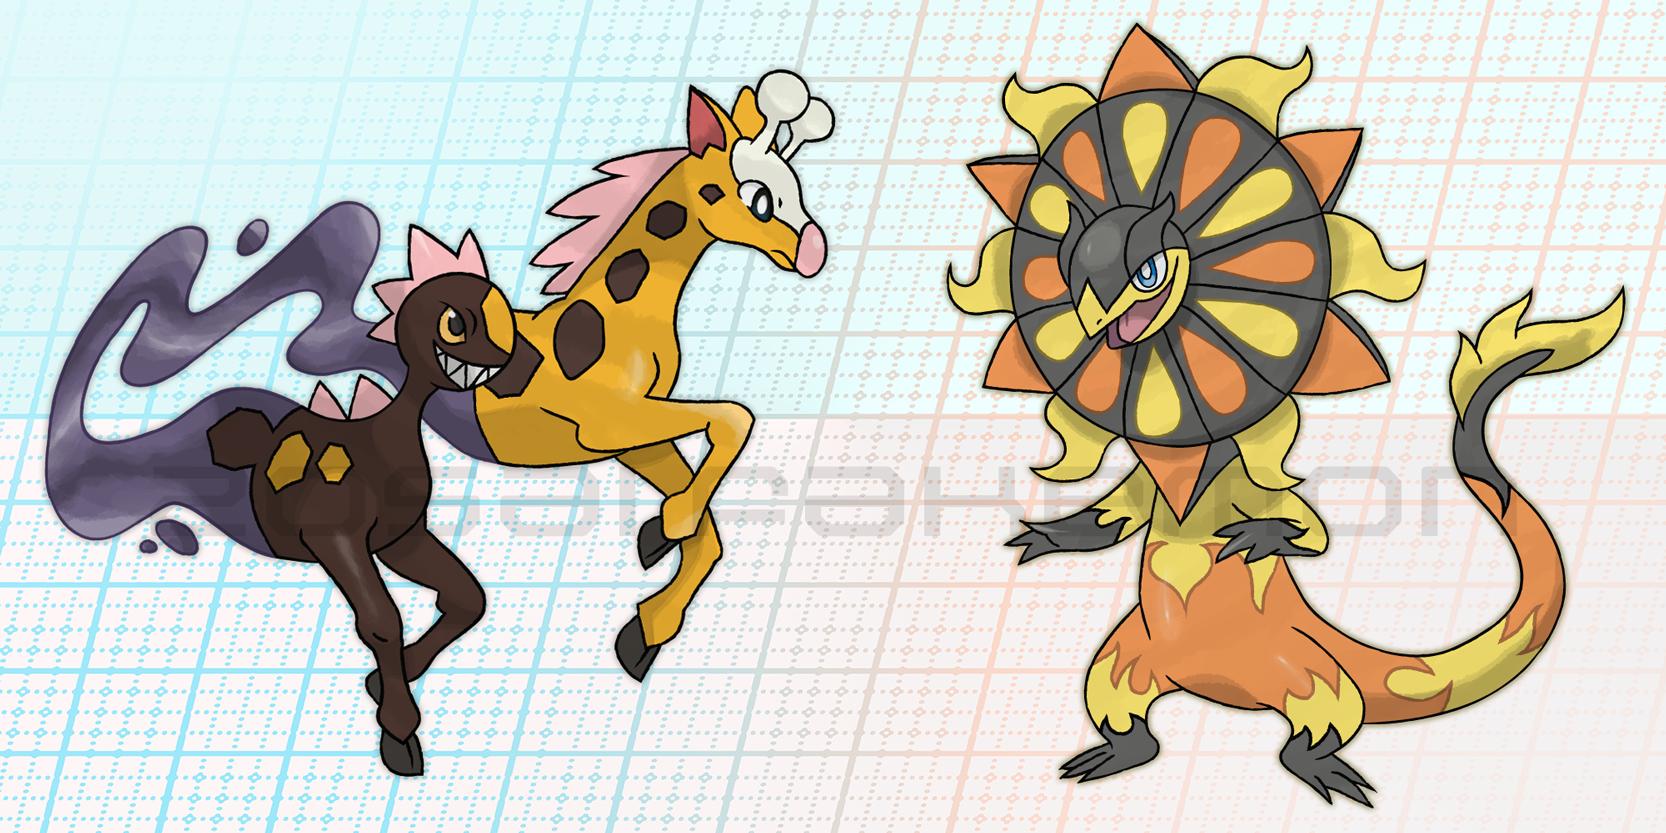 Mega evolutions fanart by zosai on deviantart - Pokemon how to mega evolve ...